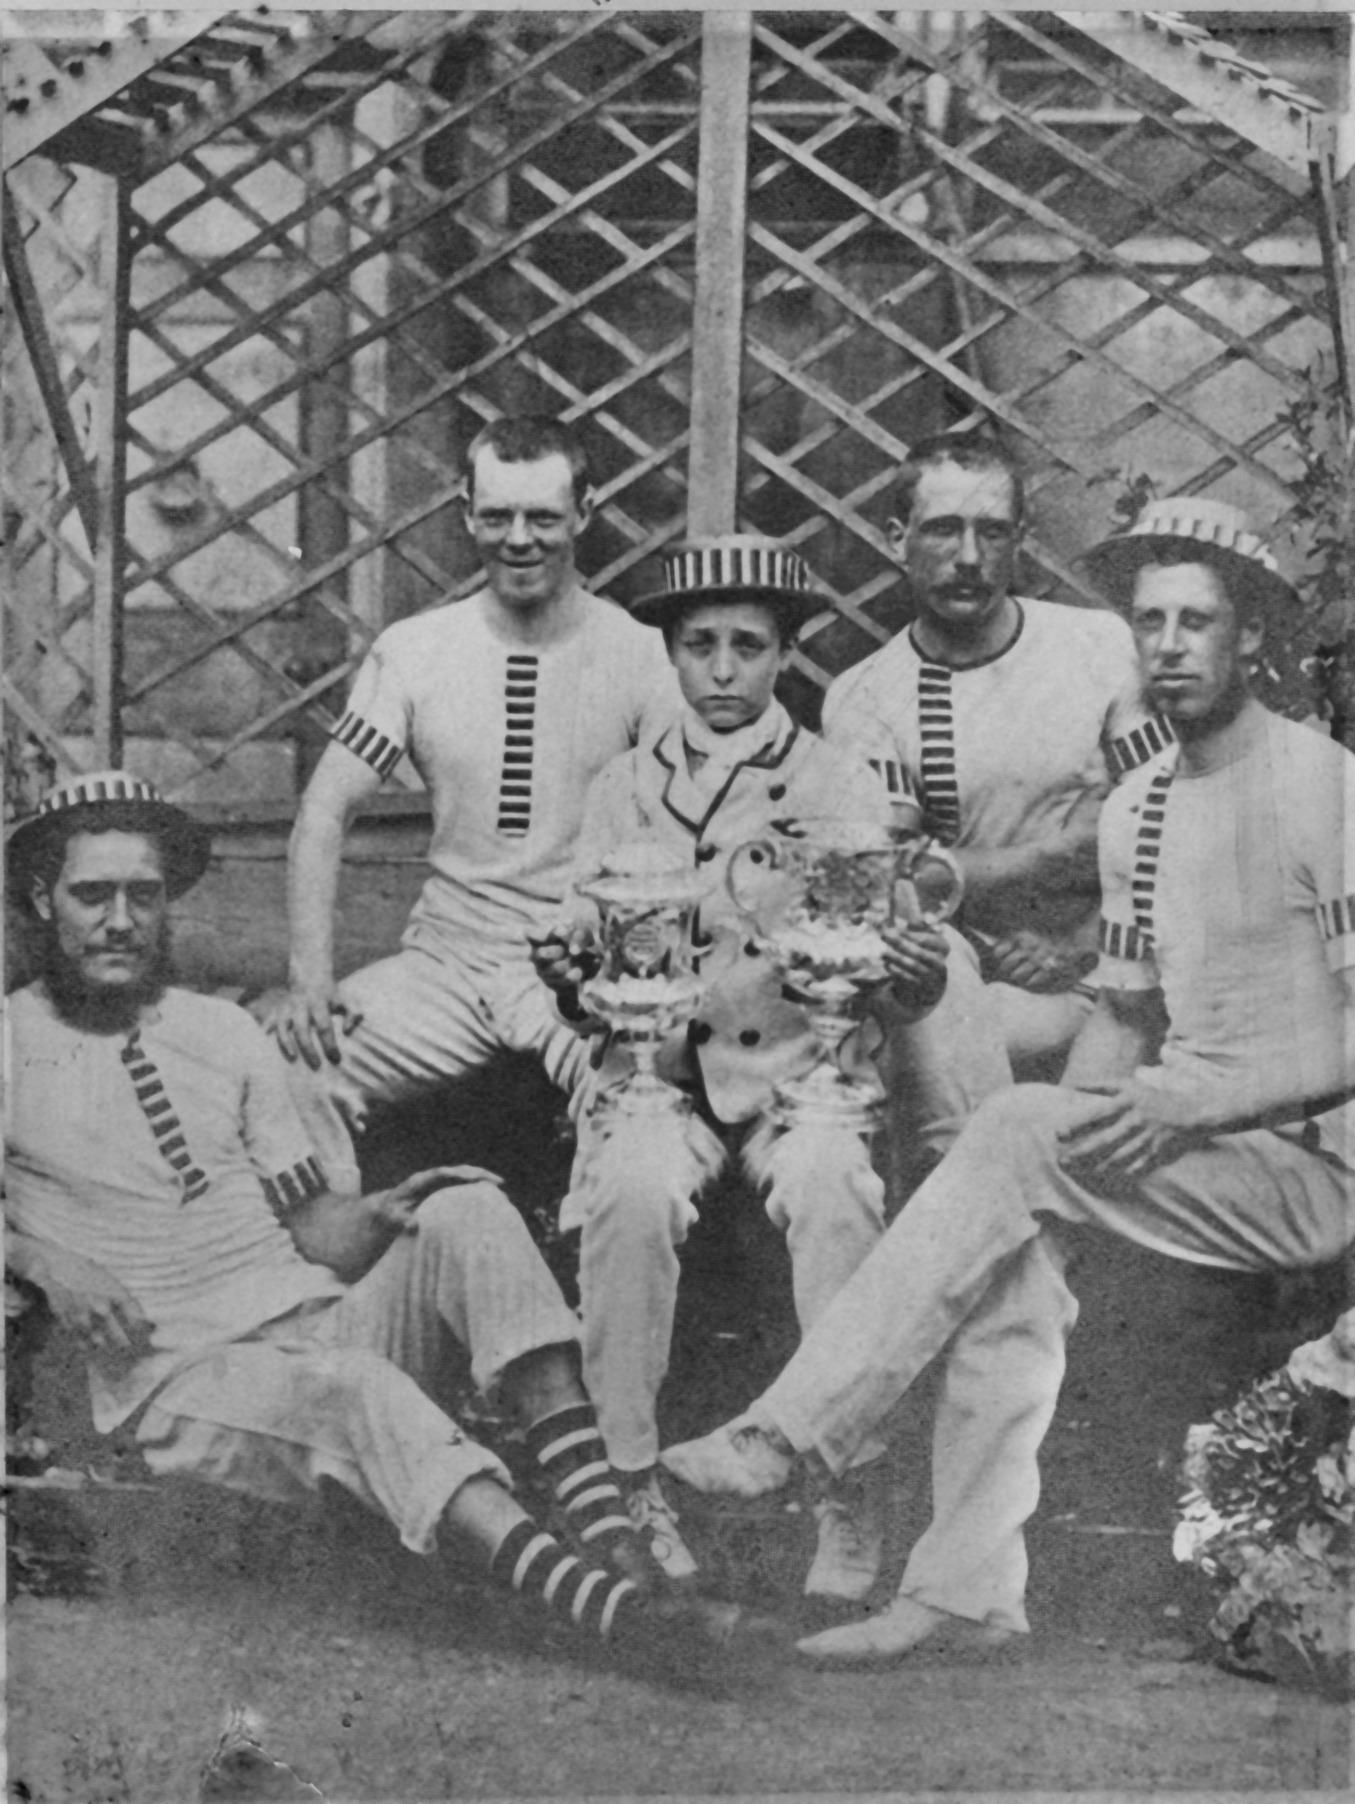 Wyfold Challenge Cup winners, 1870